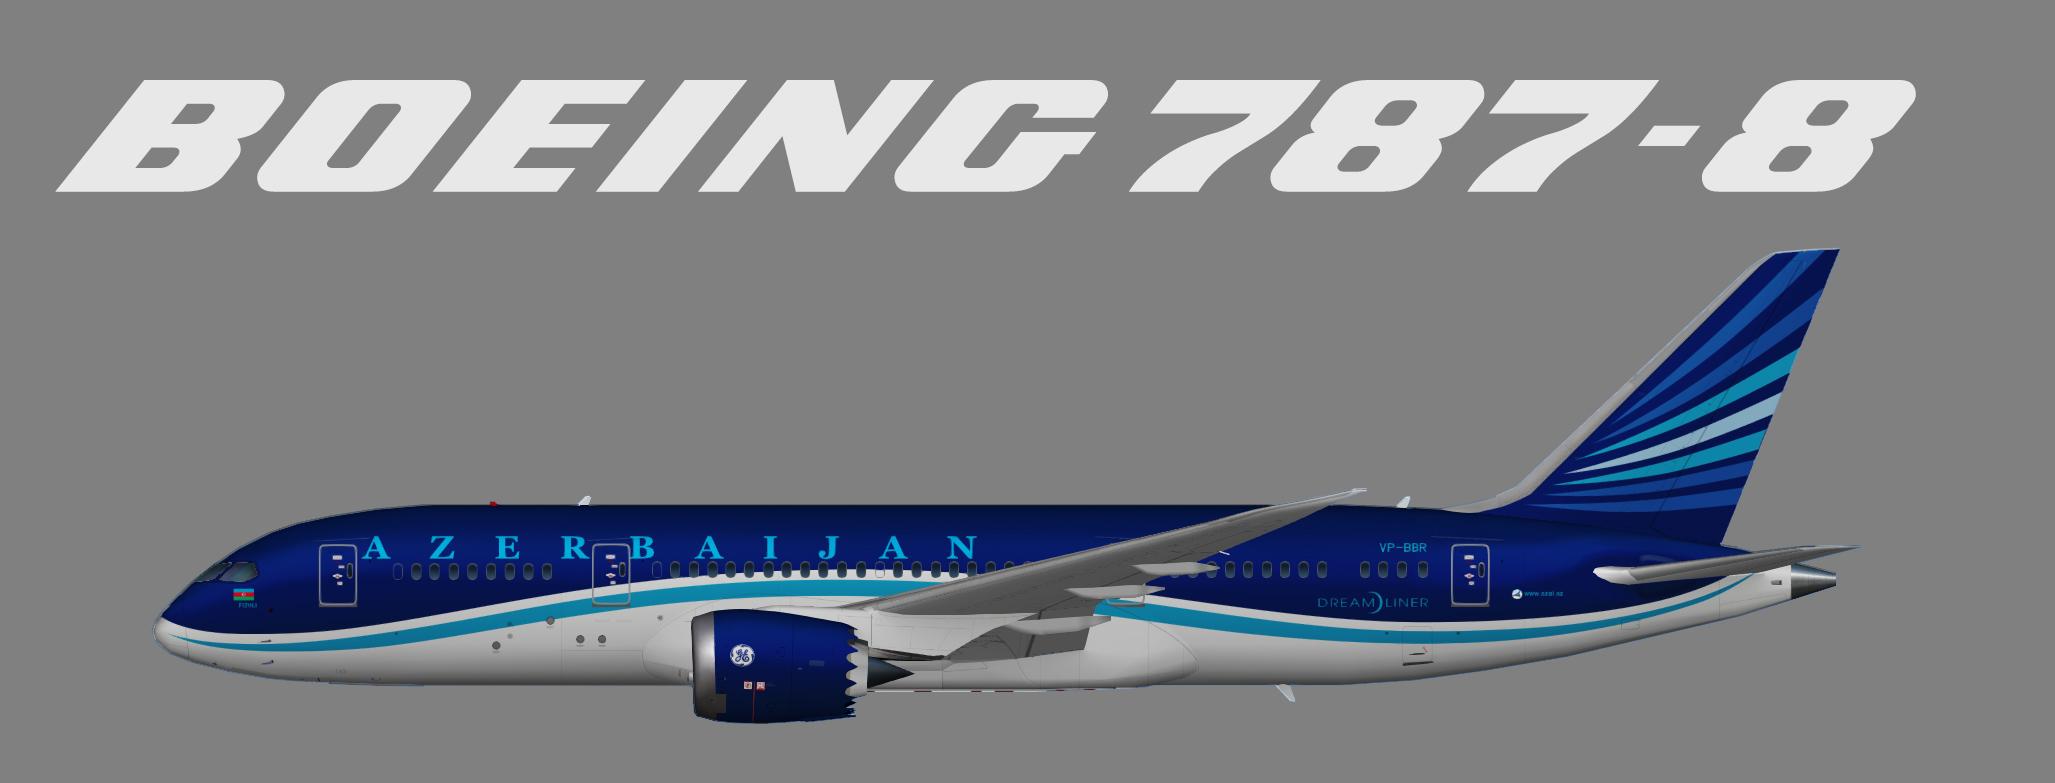 Azerbaijan Airlines (AZAL)Boeing 787-8